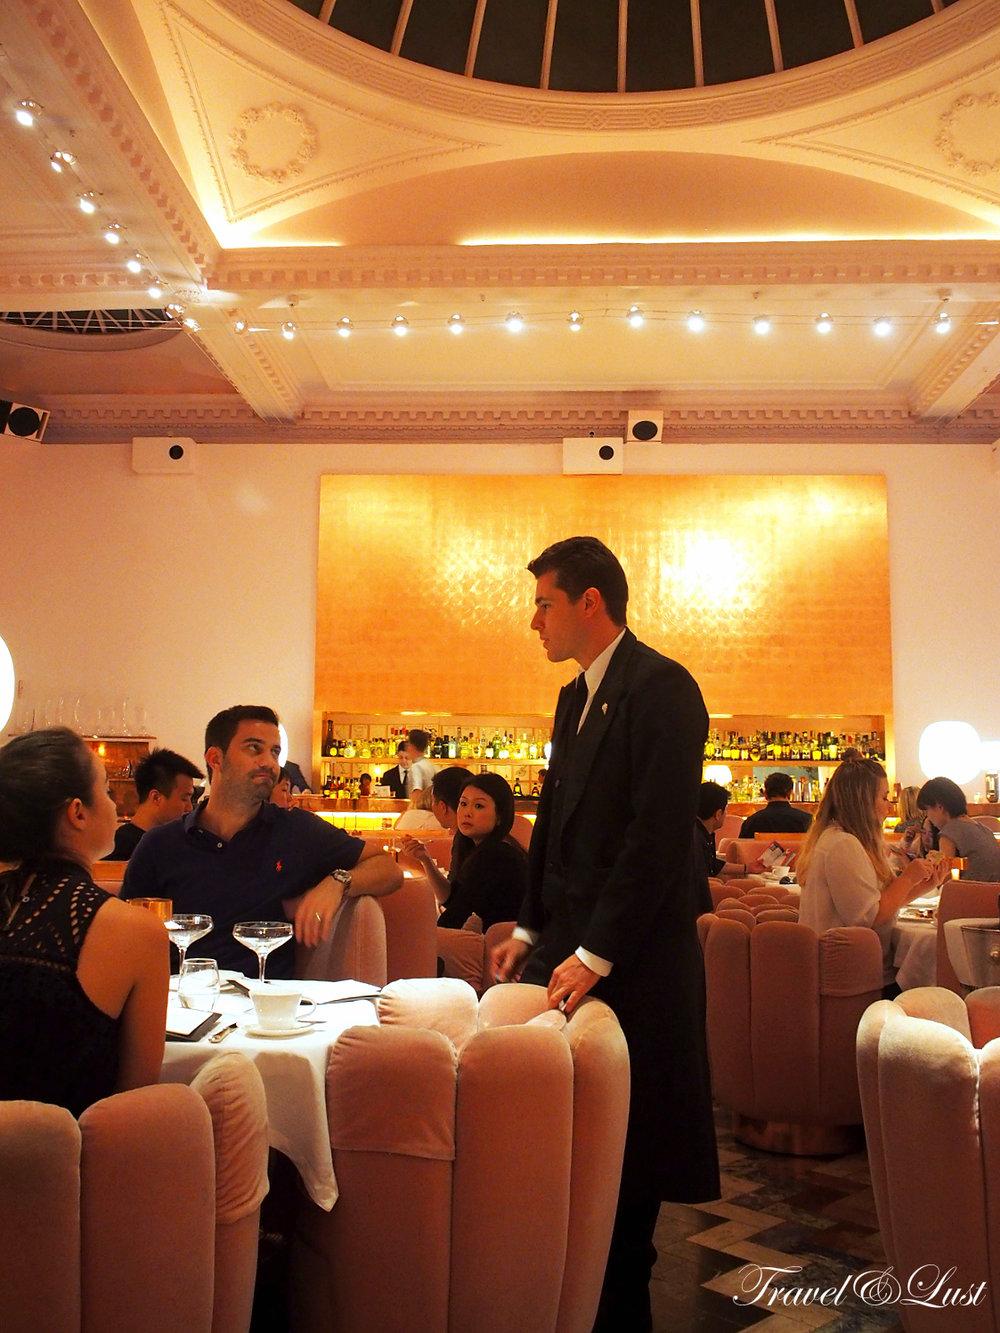 The Gallery -Modern European Gastro-Brasserie |Afternoon Tea: 12:30pm - 4:30pm (Mon-Sun) |Dinner: 6:30pm - 2am (Mon-Sat), 6:00pm - 12am (Sun)